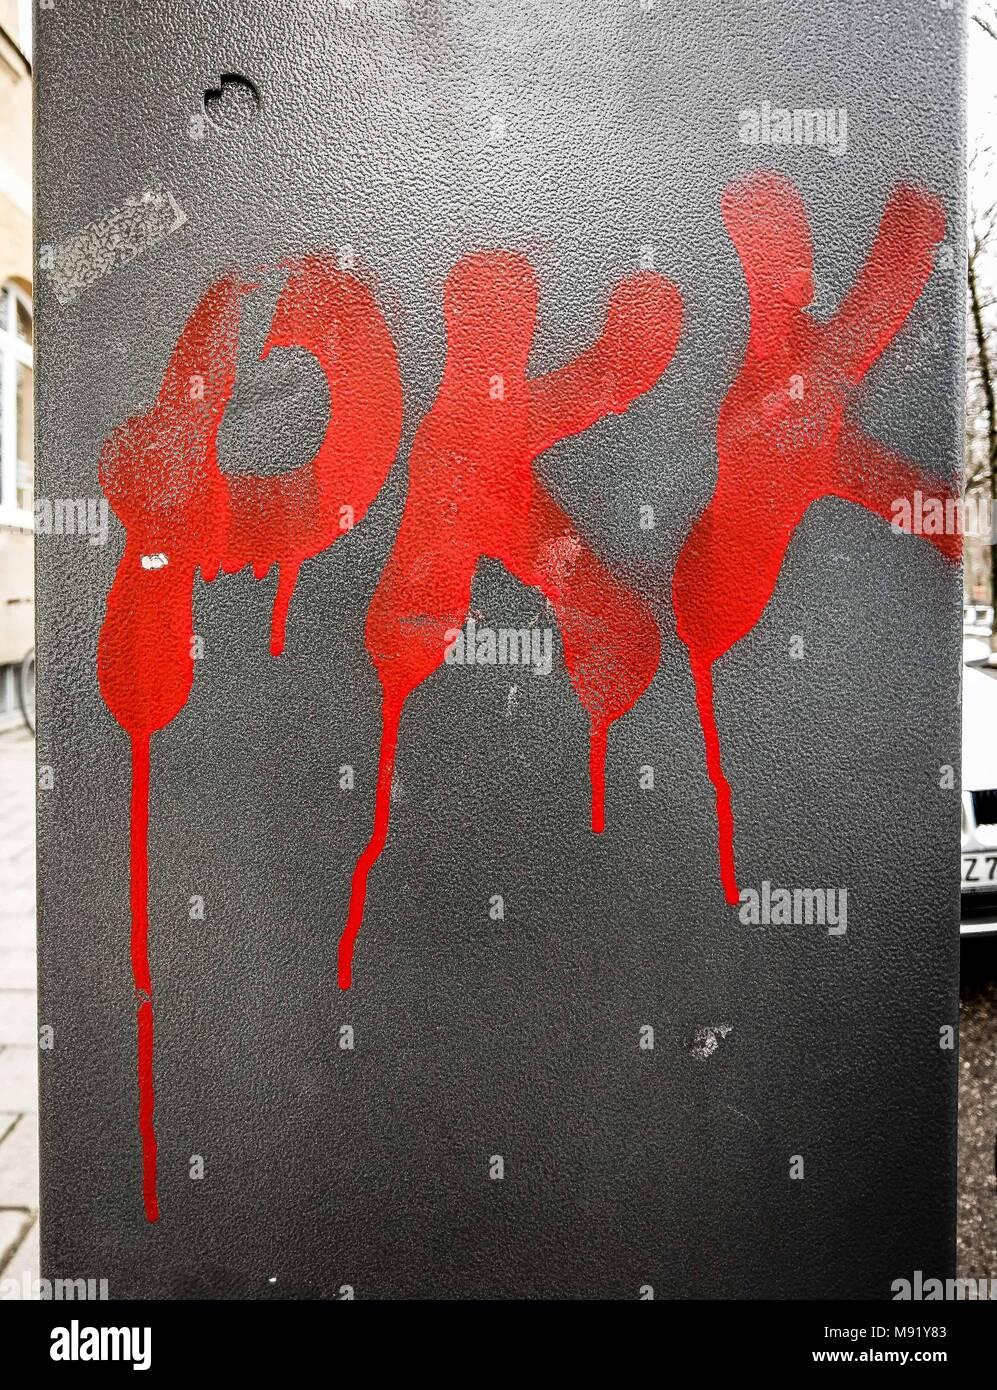 March 21, 2018 - PKK graffiti in a Kurdish neighborhood in Munich ...